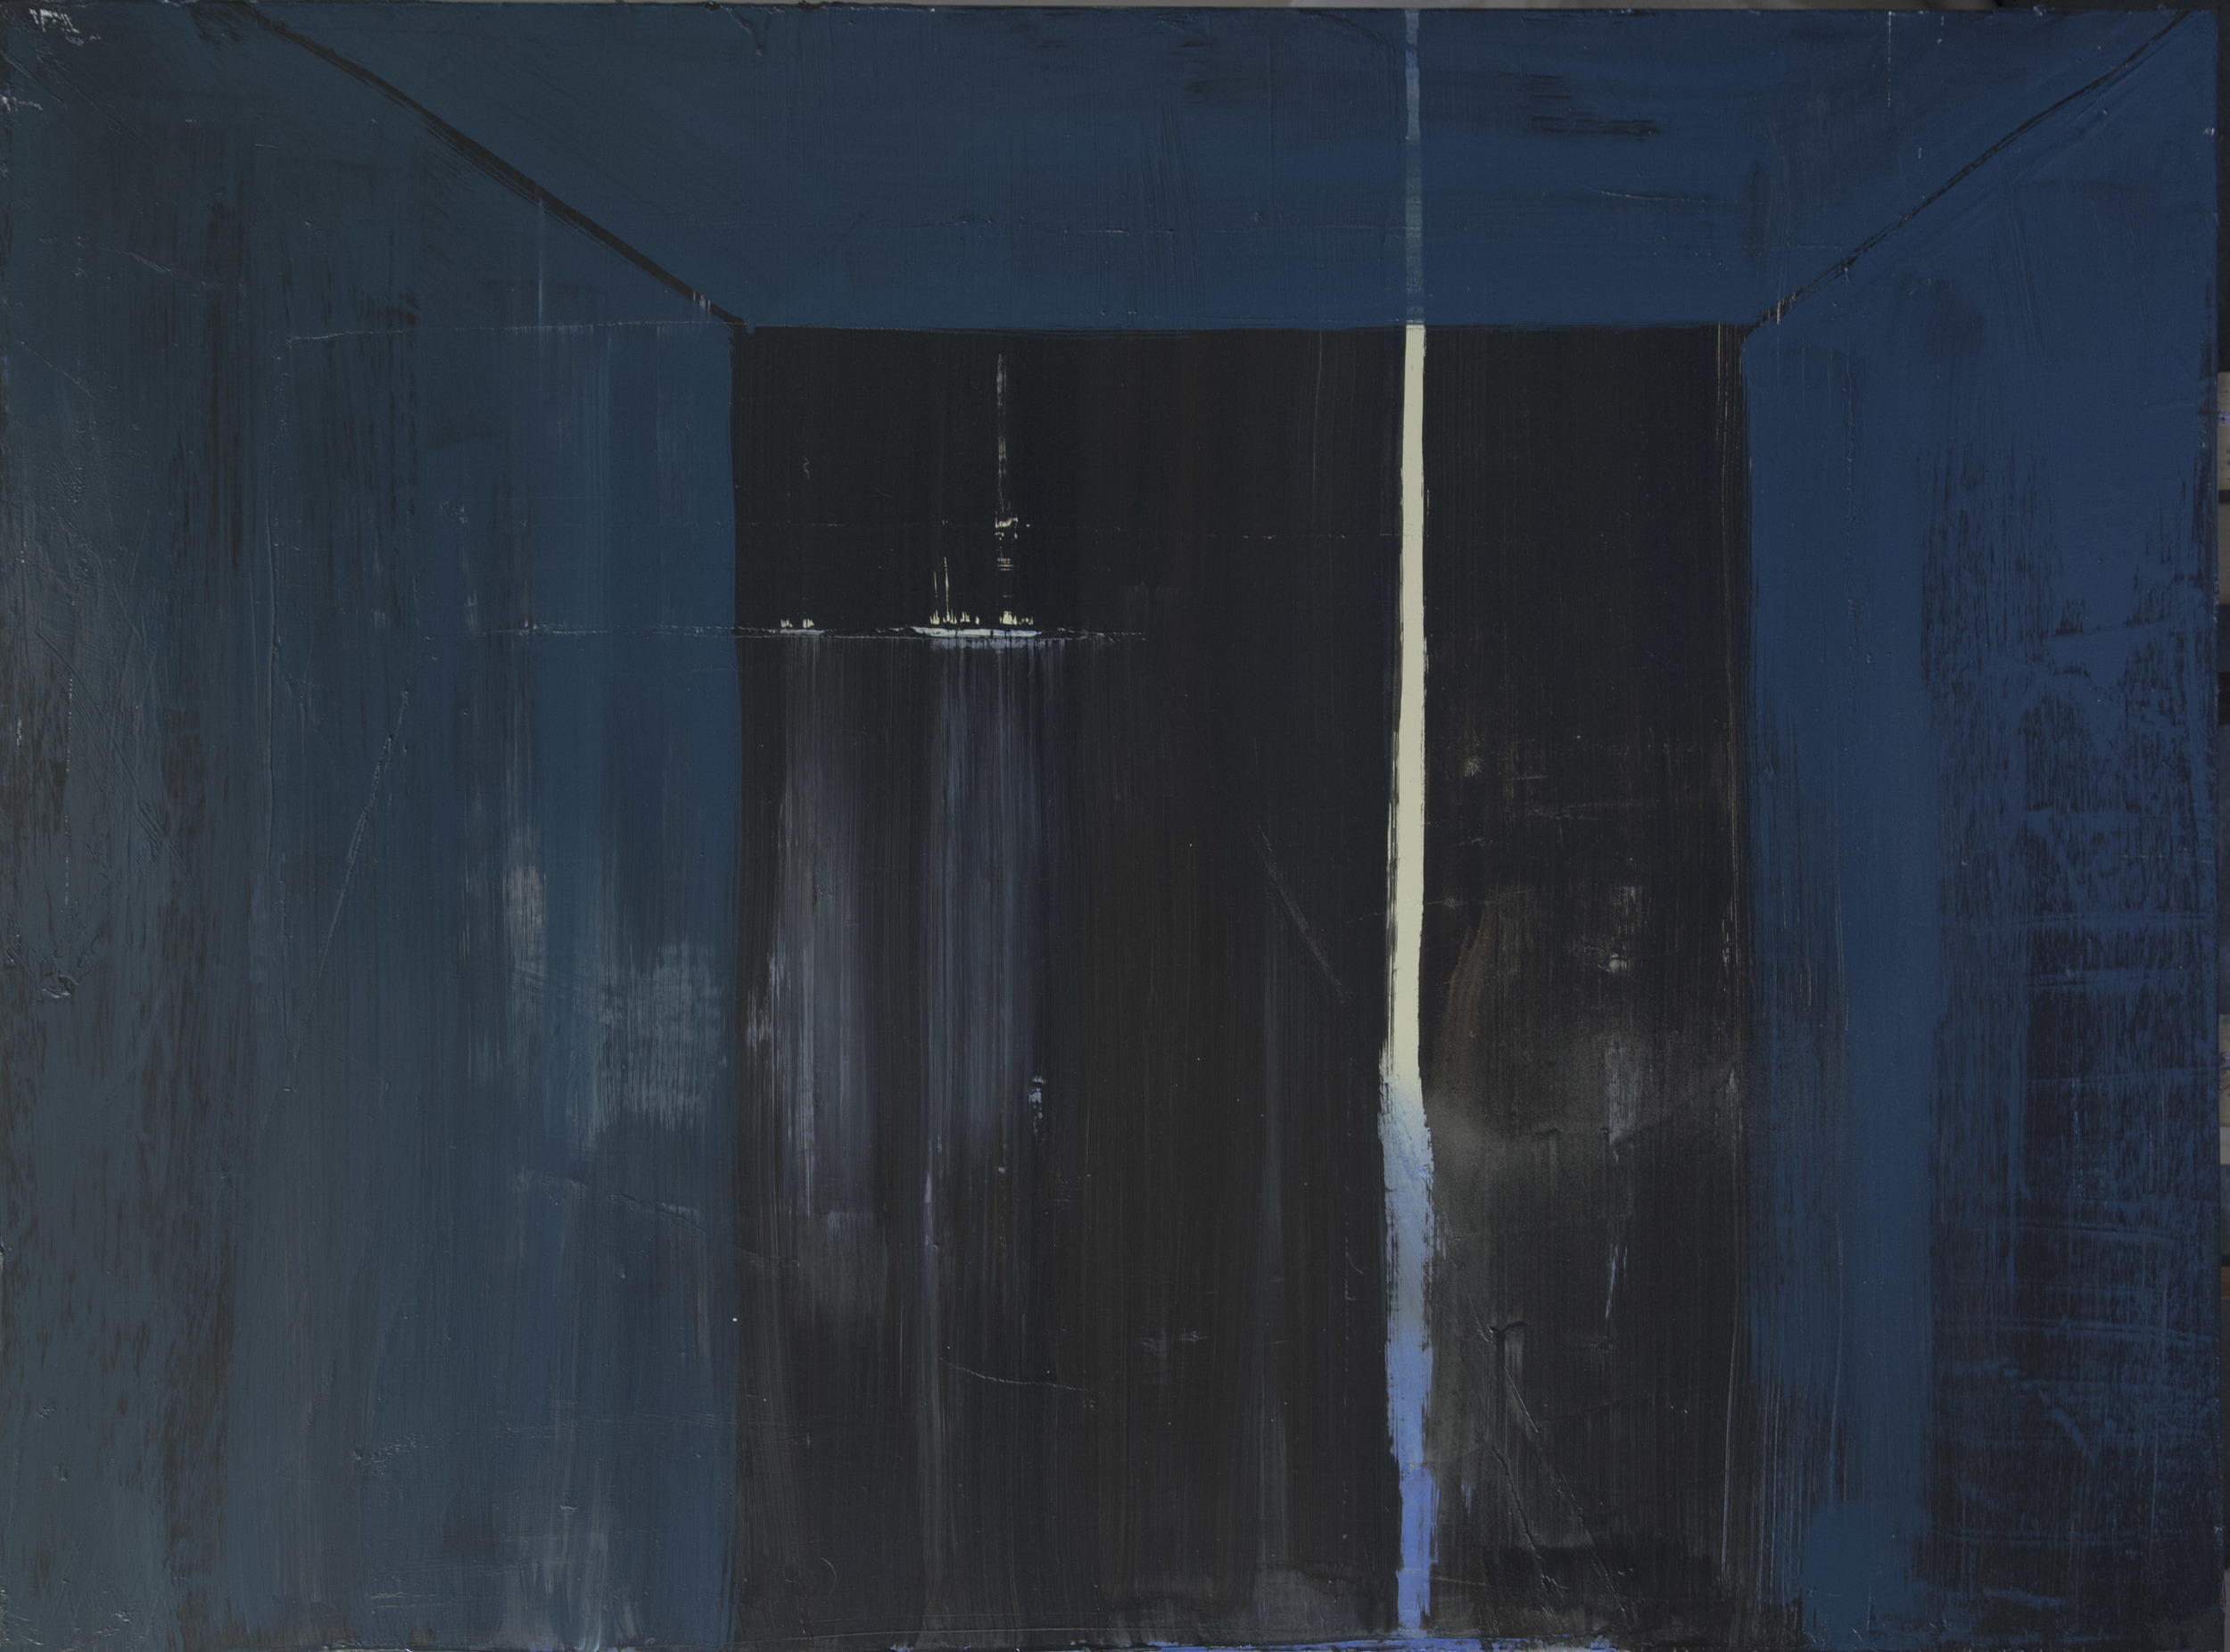 2015, 97x153 cm, oil on canvas